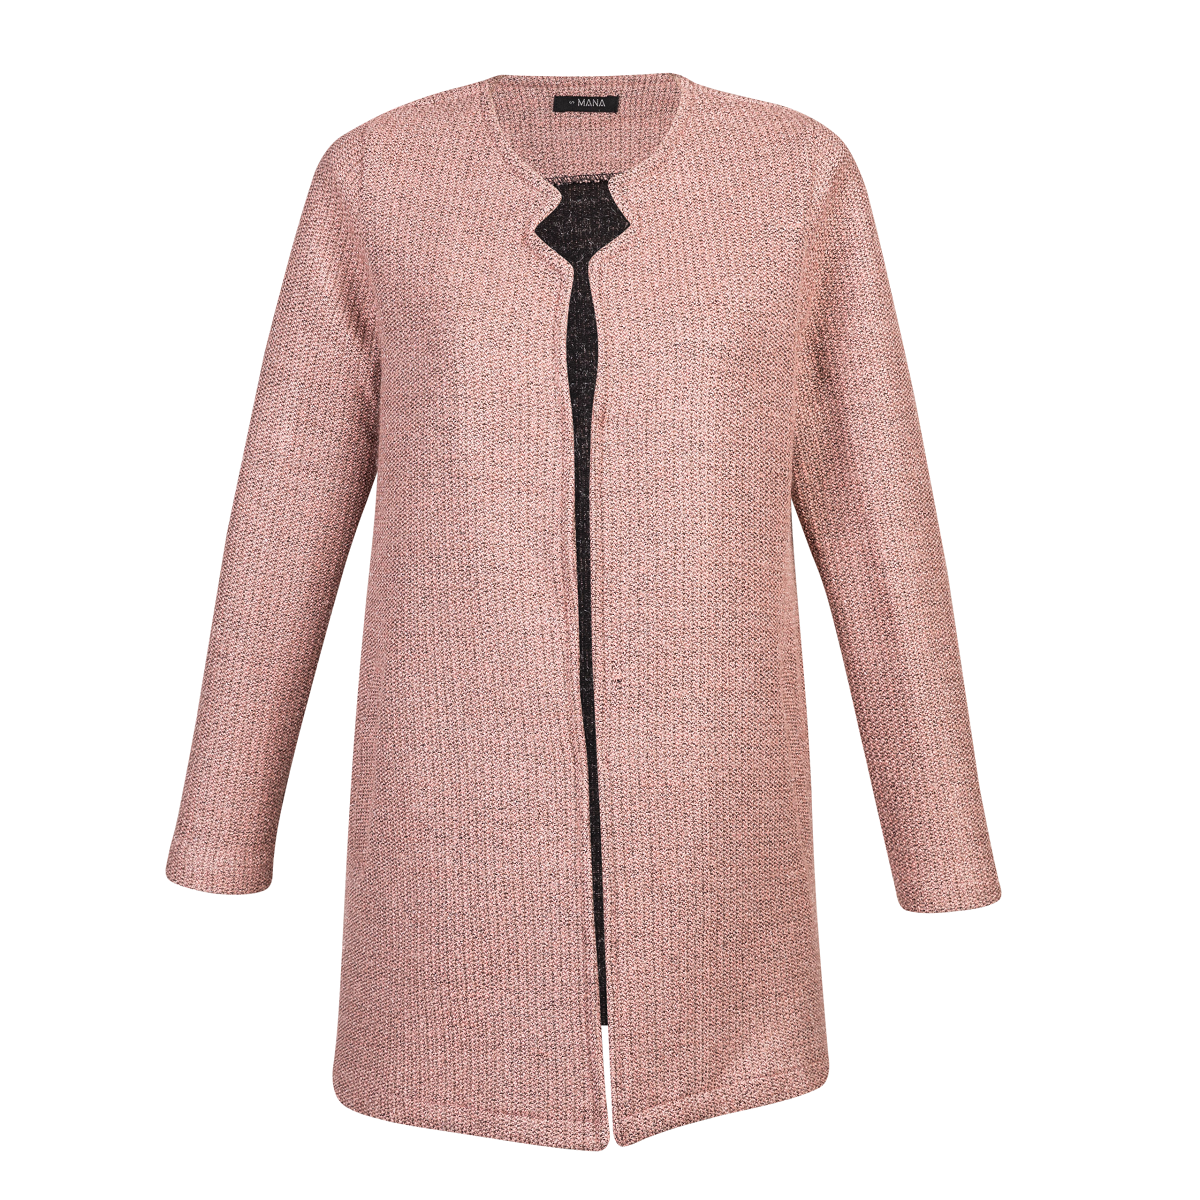 Ženska jakna, svetlo roza